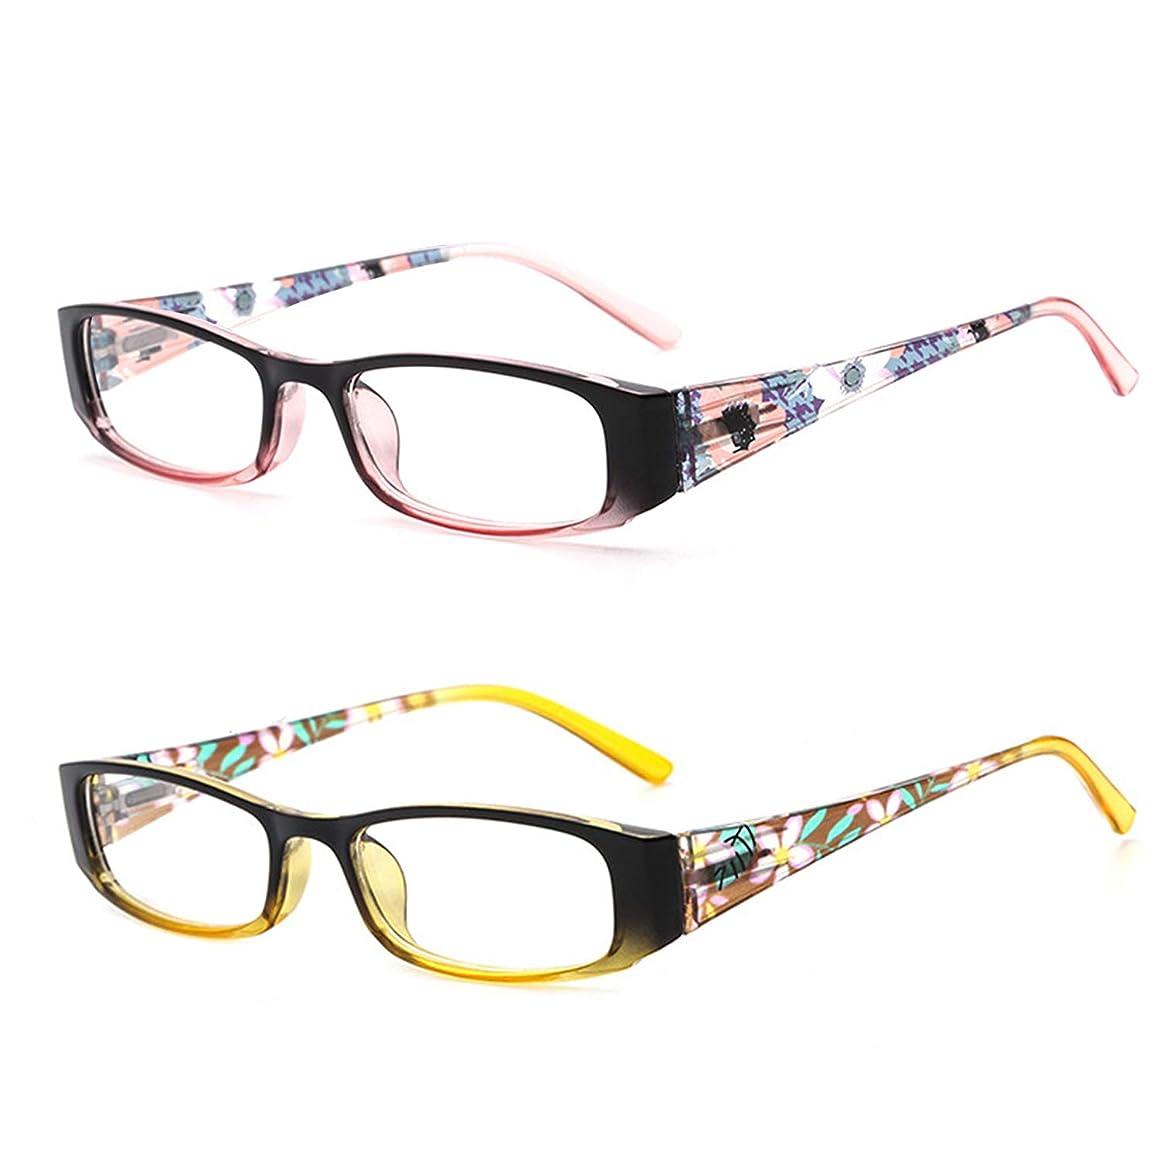 HUYAOPT Blue Light Blocking 2 Pair Glasses Spring Hinges UV Protection Computer Glasses for Women/Men, Prevent Eye Fatigue. (3.5 X)